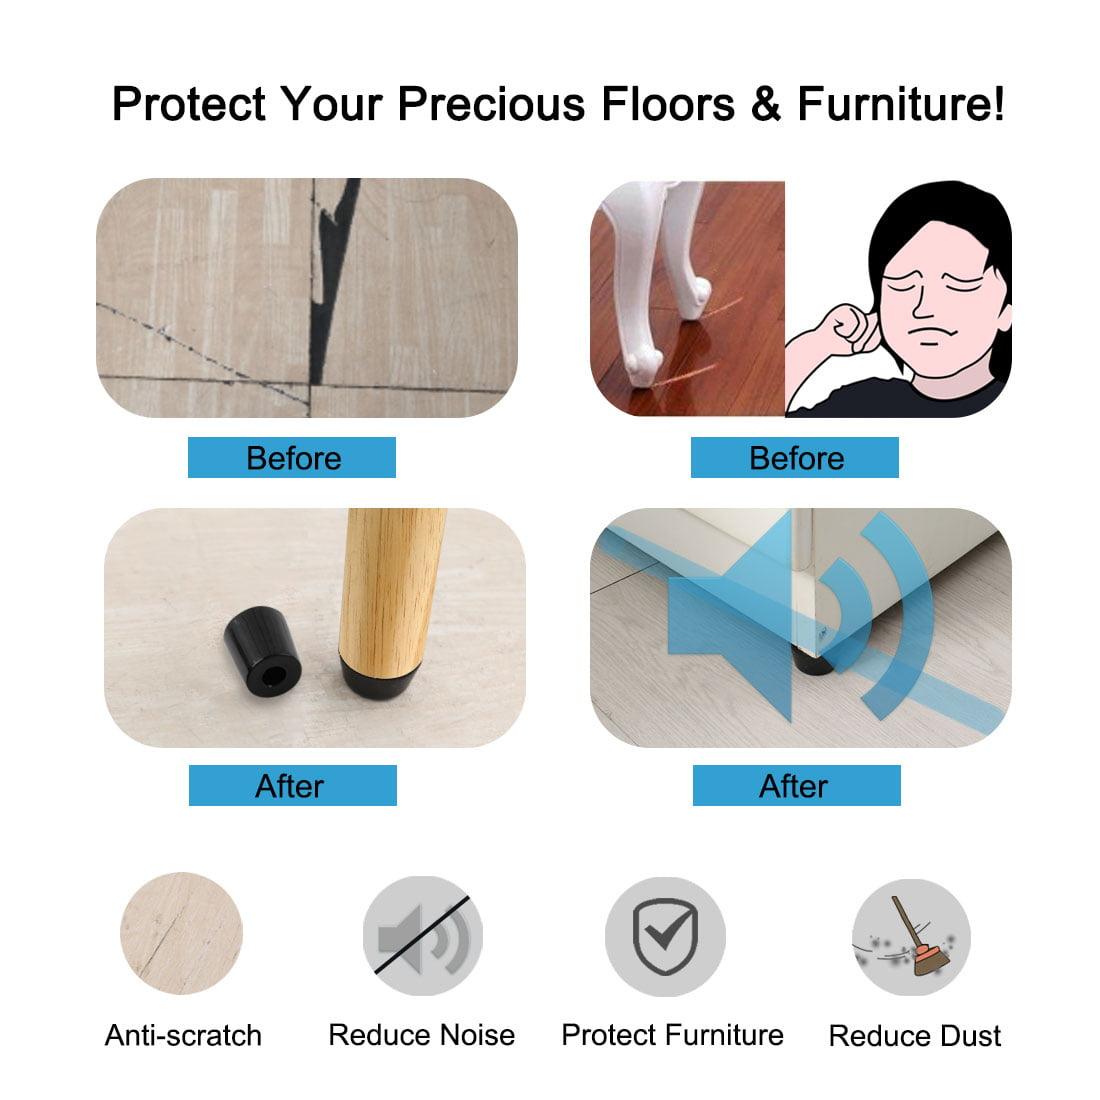 35pcs Rubber Feet Bumper Cabinet Amplifier Speaker Desk Leg Pads, D33x27xH33mm - image 5 of 7